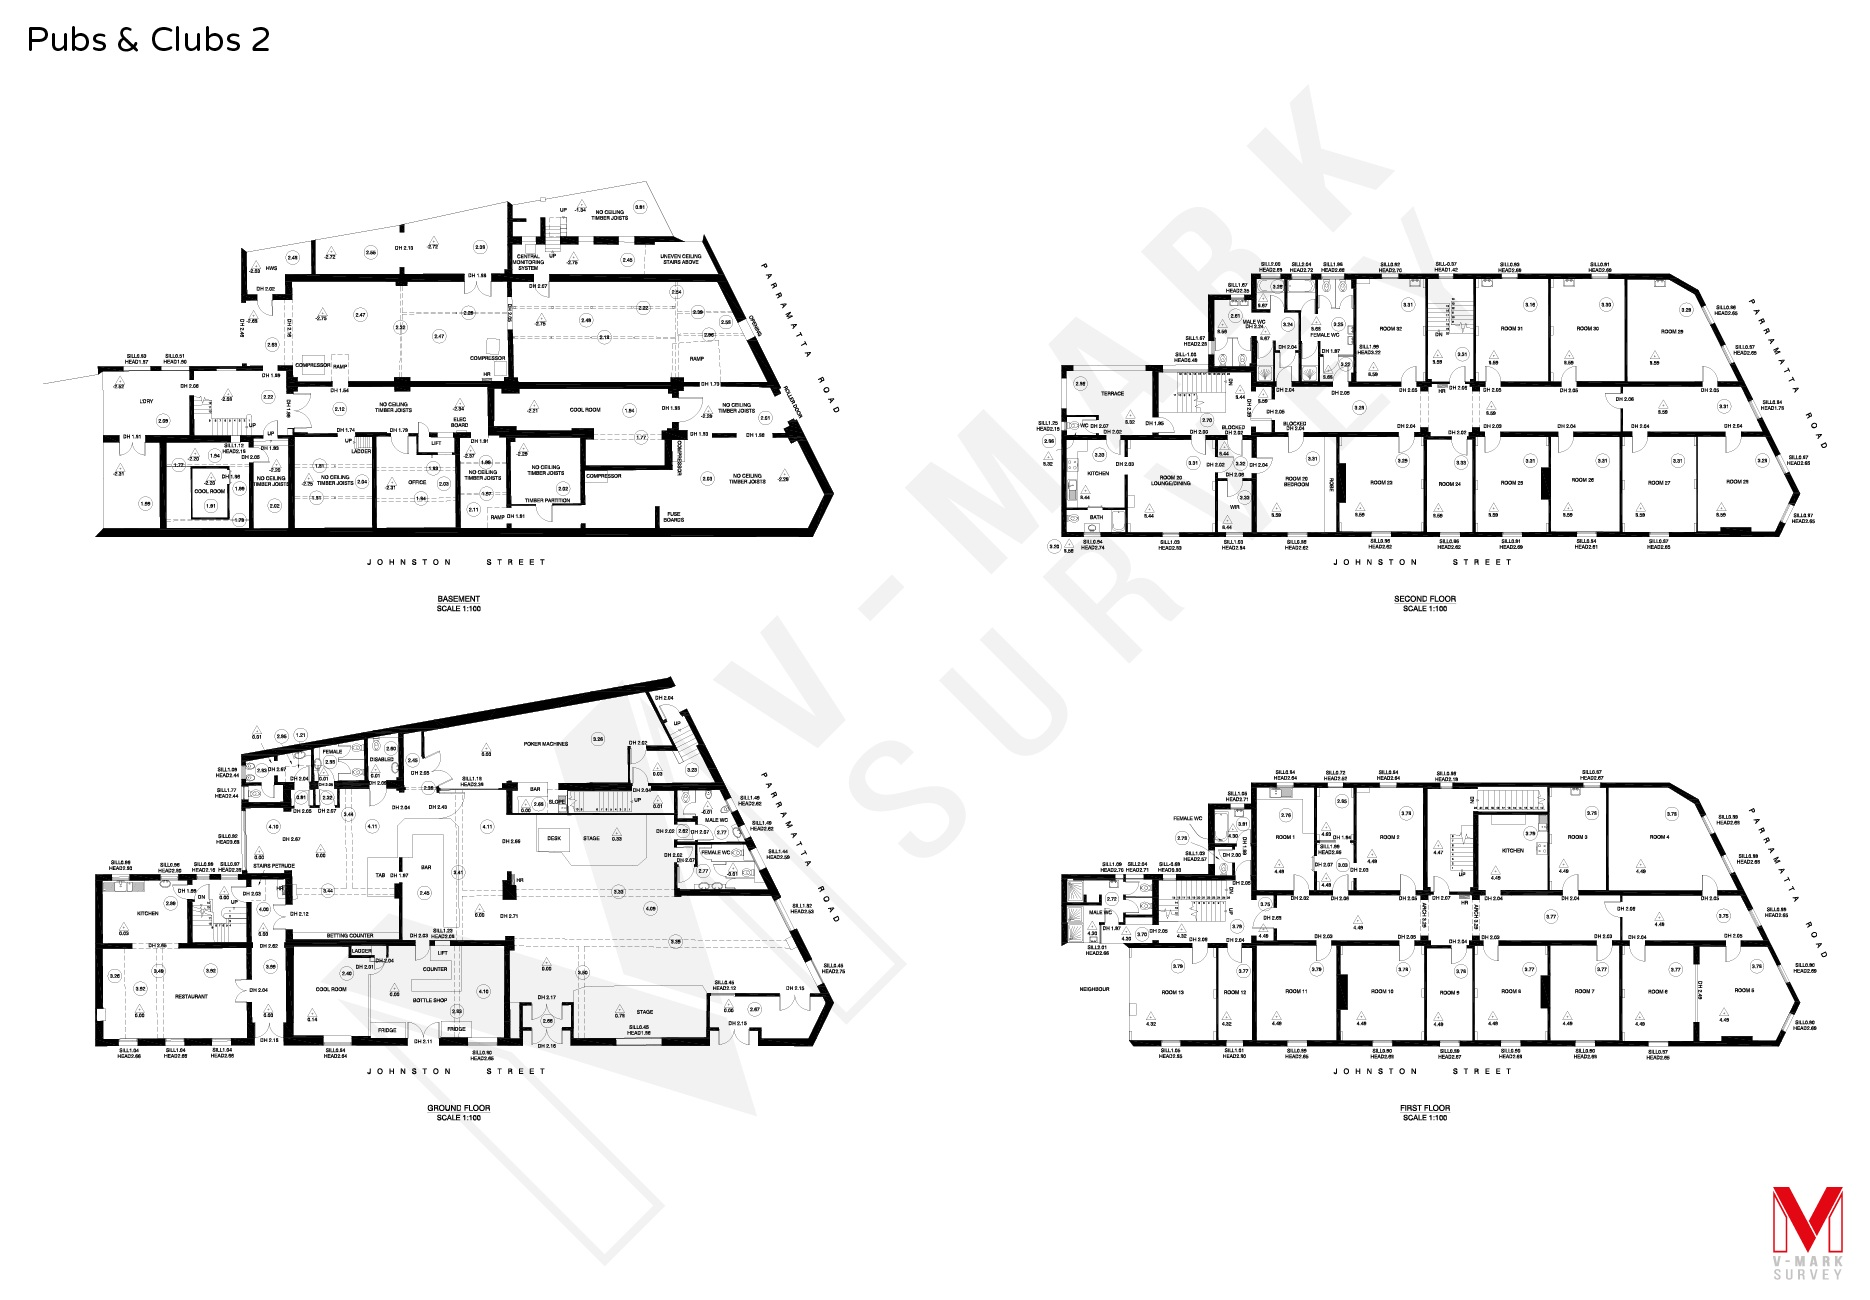 Pubs & Clubs Floorplans